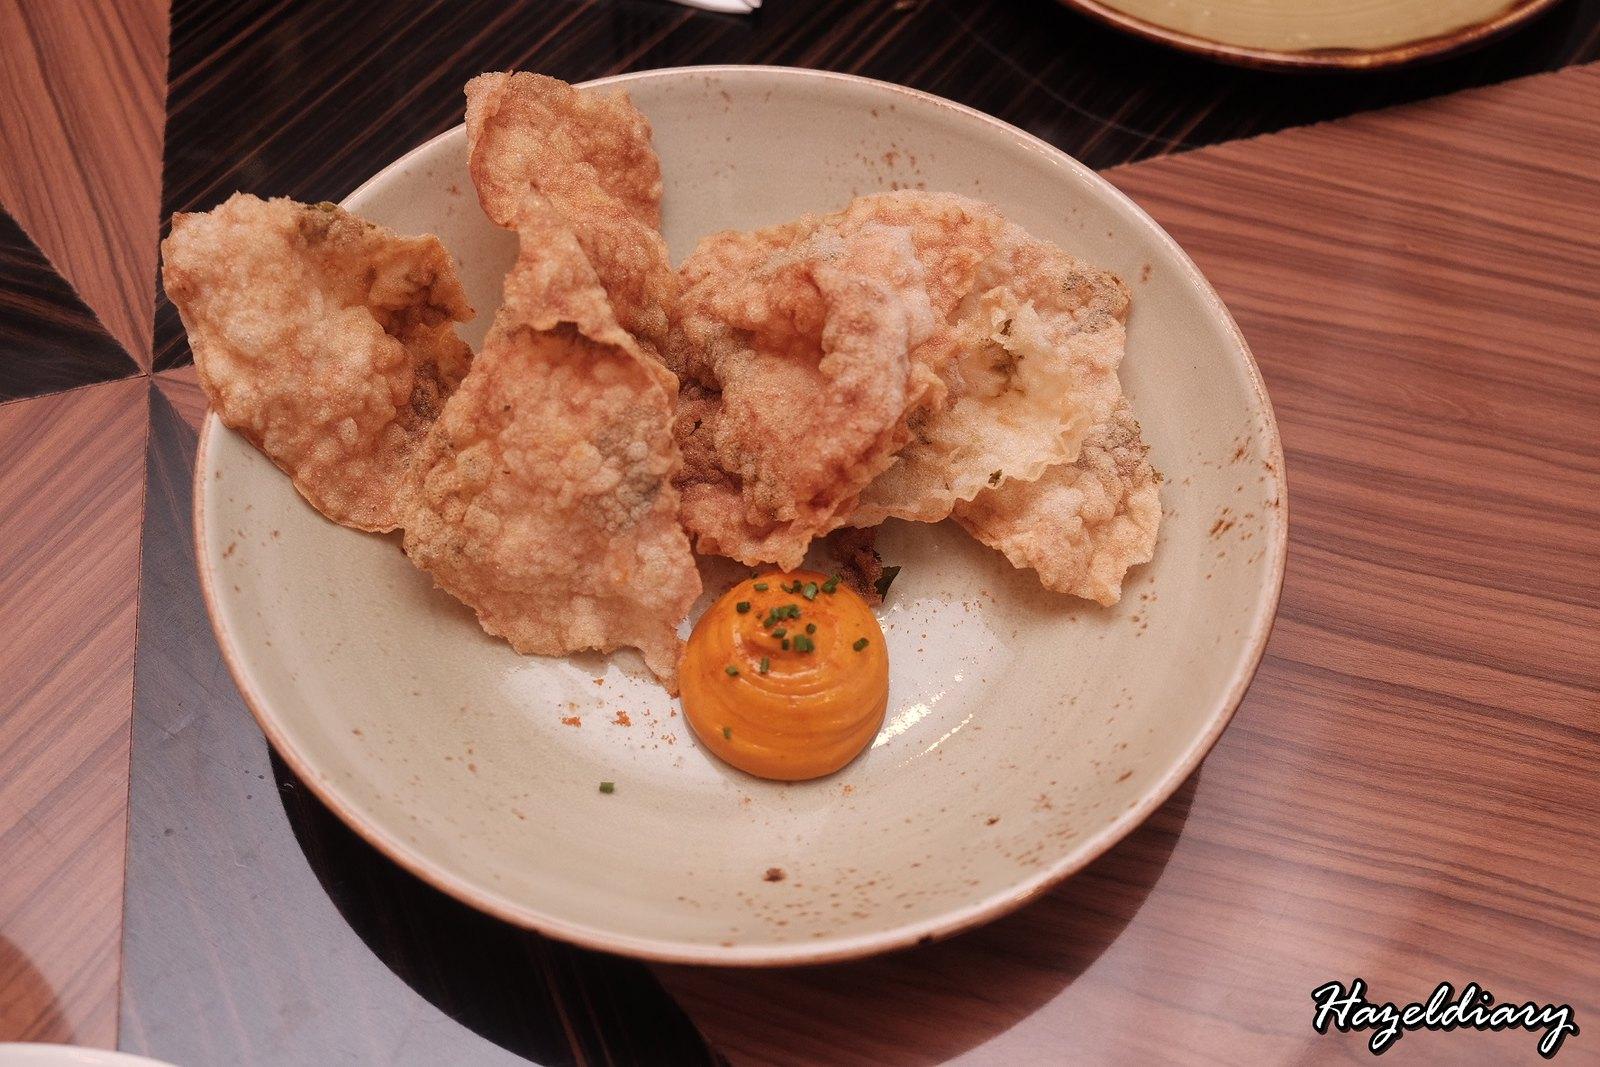 Porta x Ah Hua Kelong Fish Farm-Cracker with curry mayonnaise